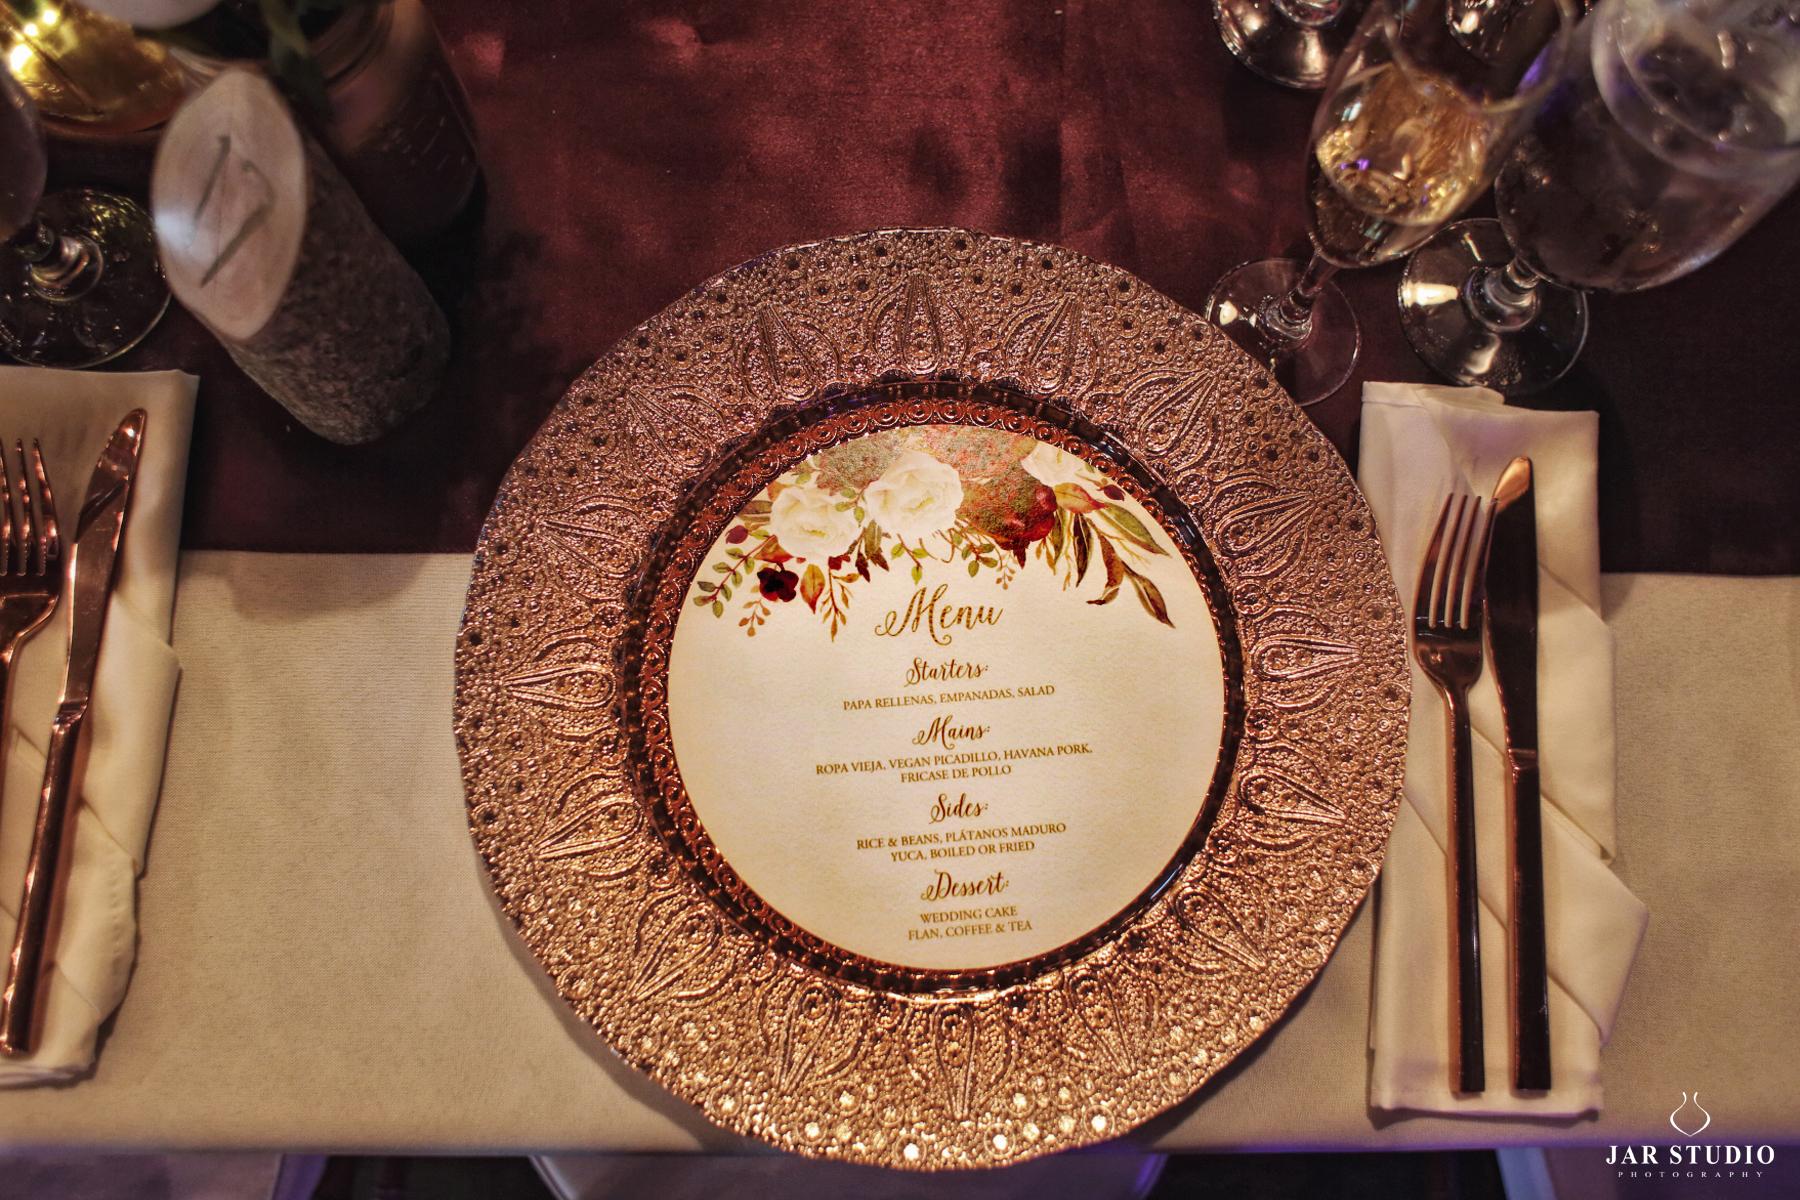 jarstudio-wedding-photographer-highend-menu-490.JPG